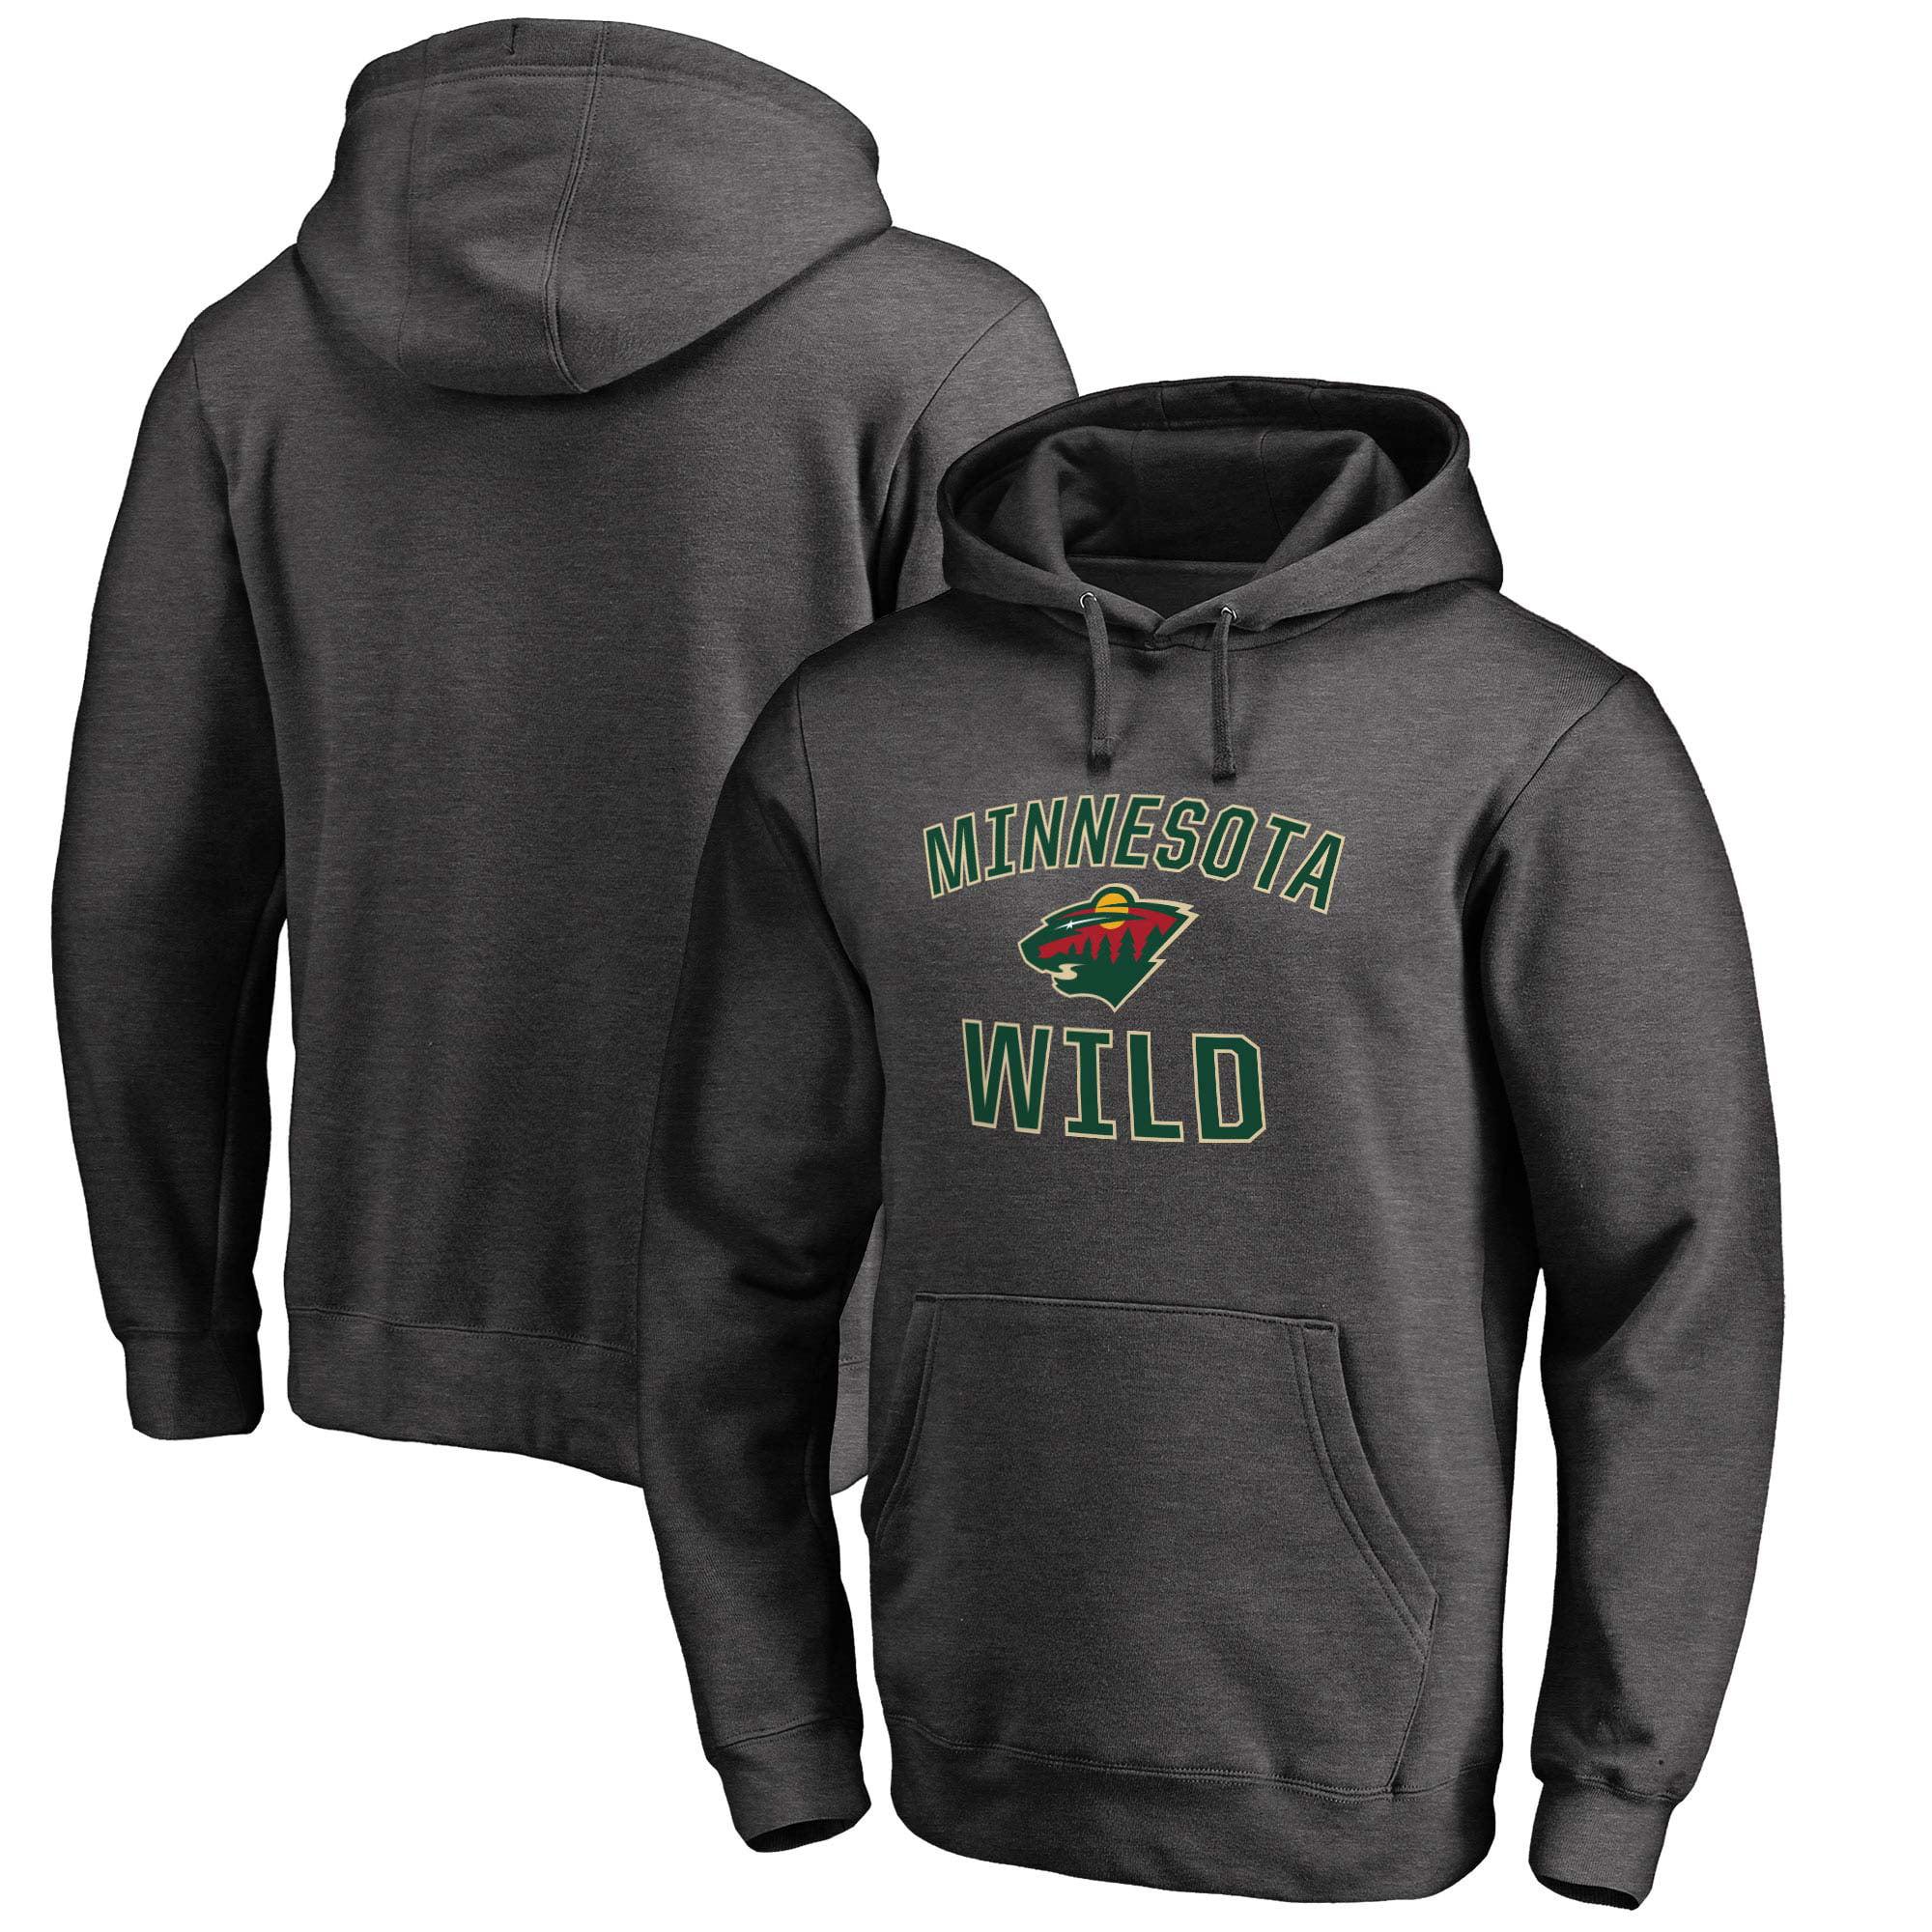 Minnesota Wild Victory Arch Fleece Pullover Hoodie - Dark Gray